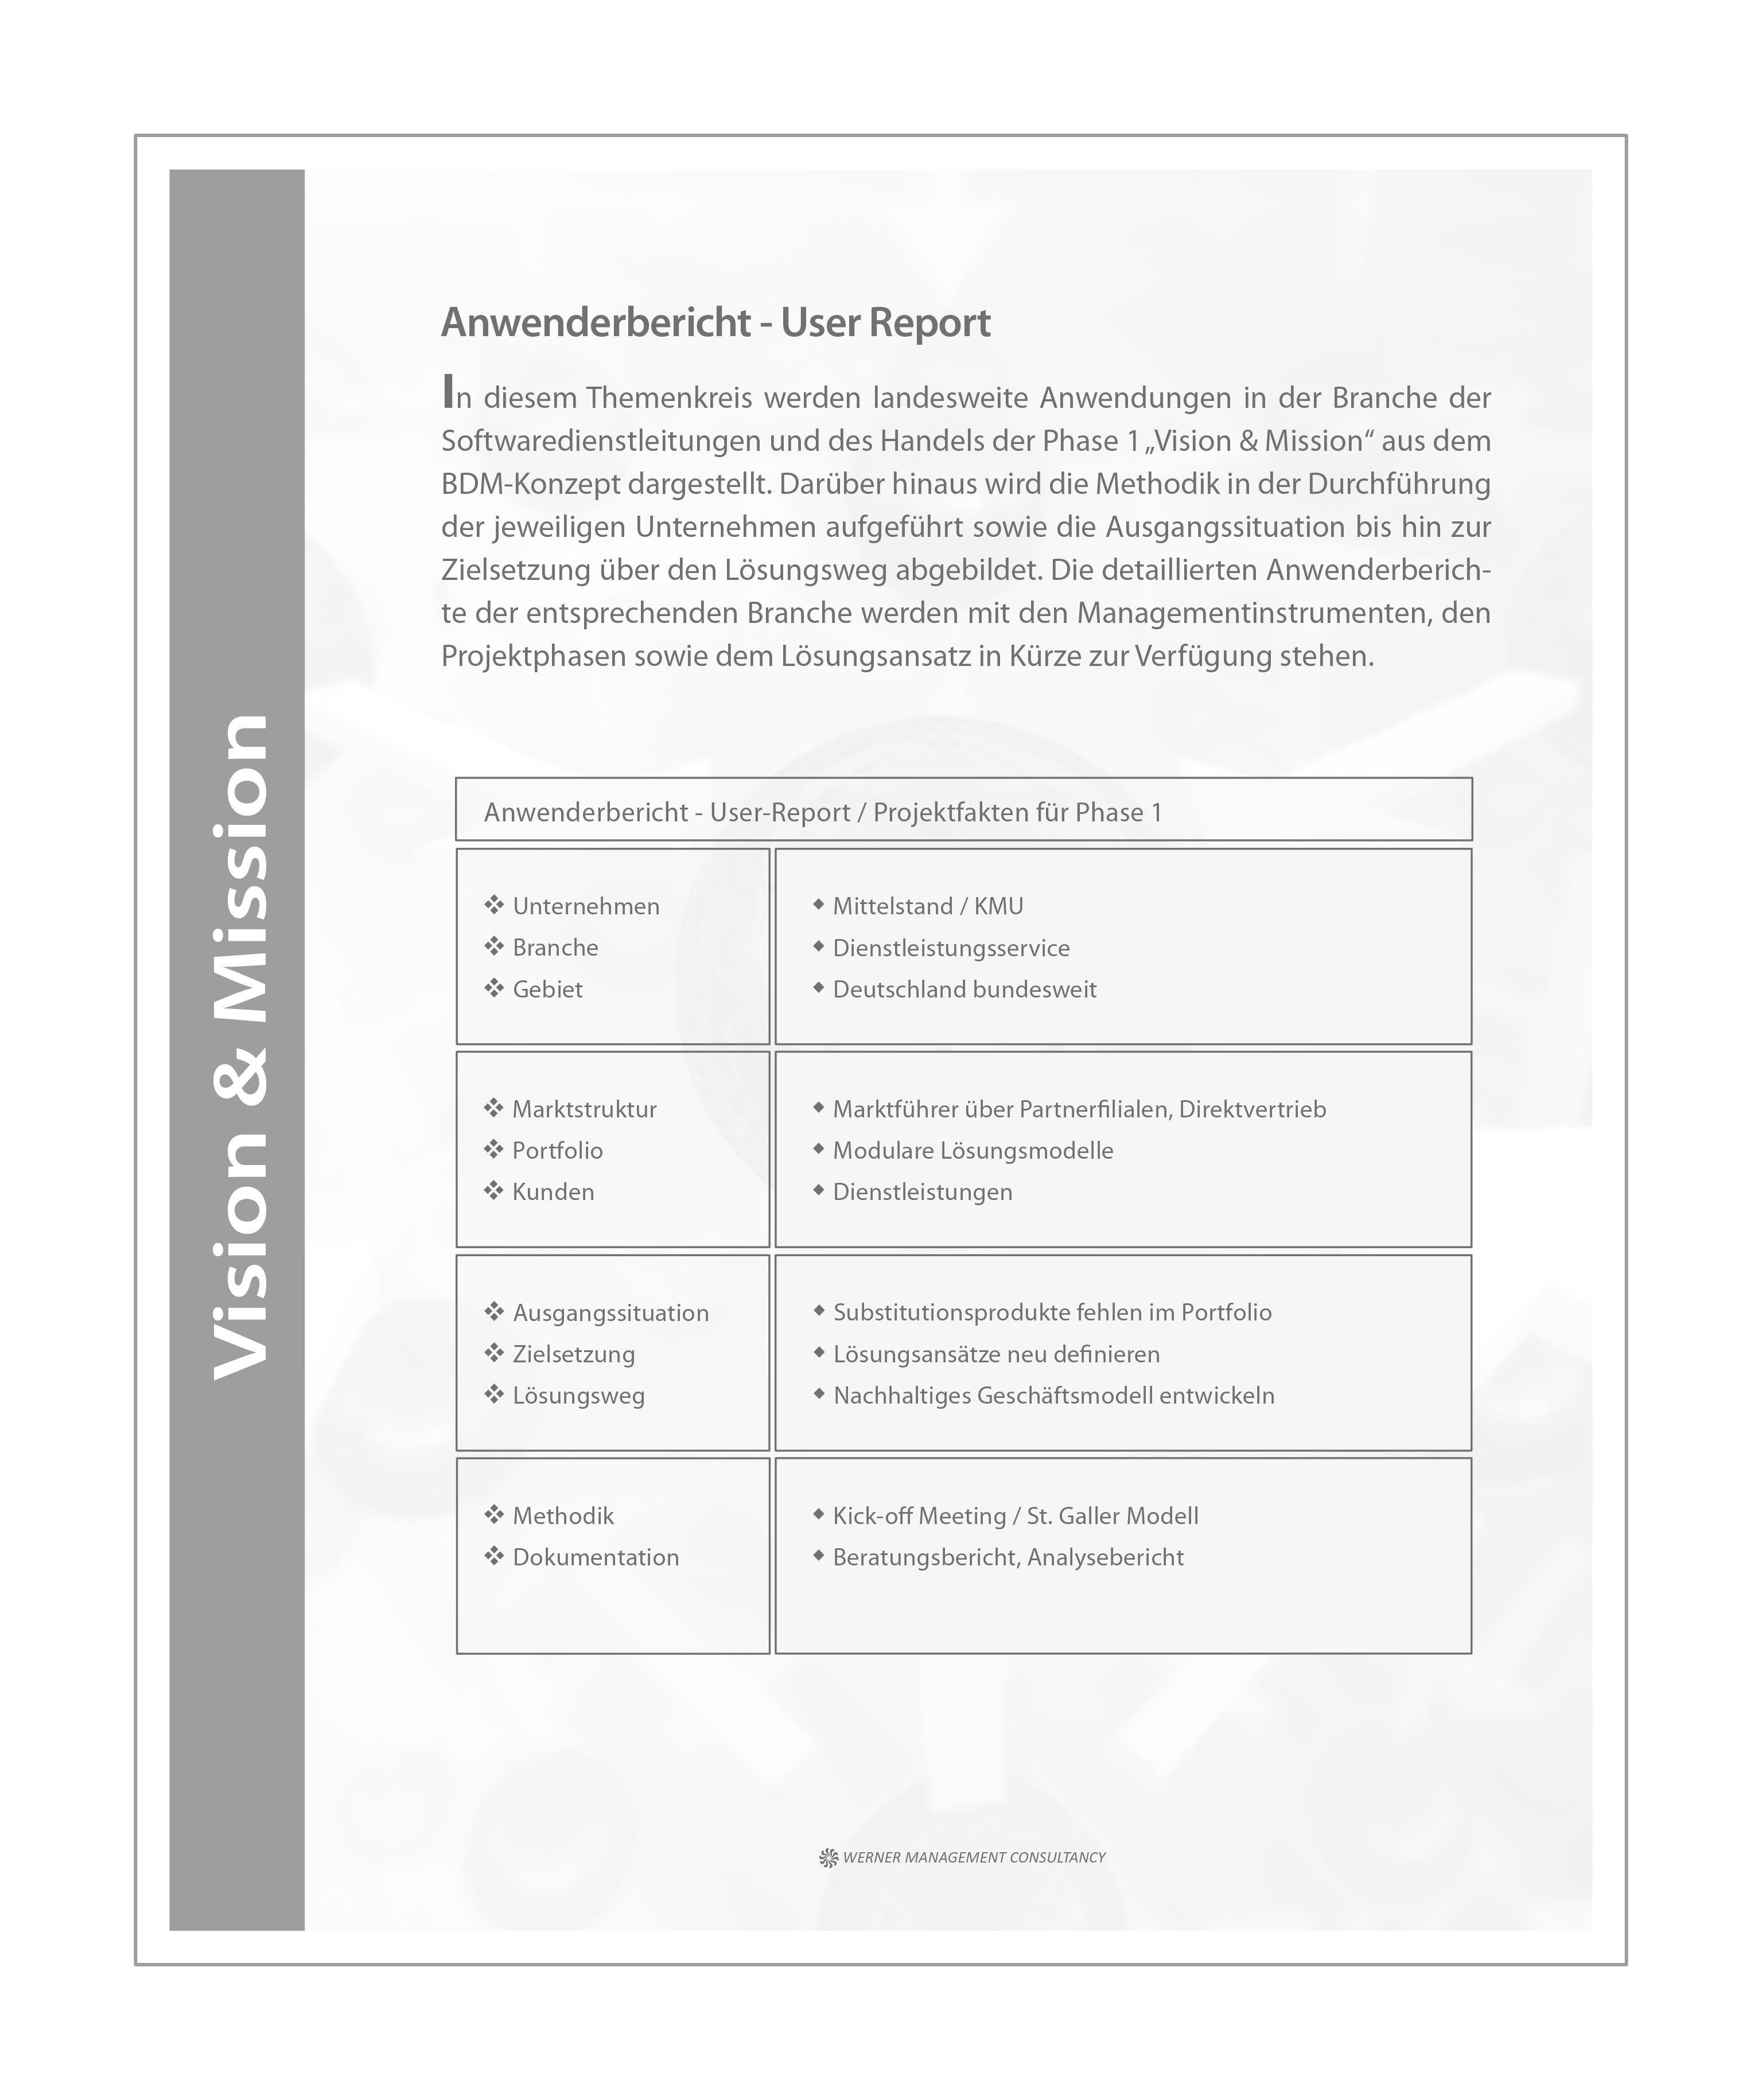 WMC Broschüre Business Development Phase-1 Anwenderbericht